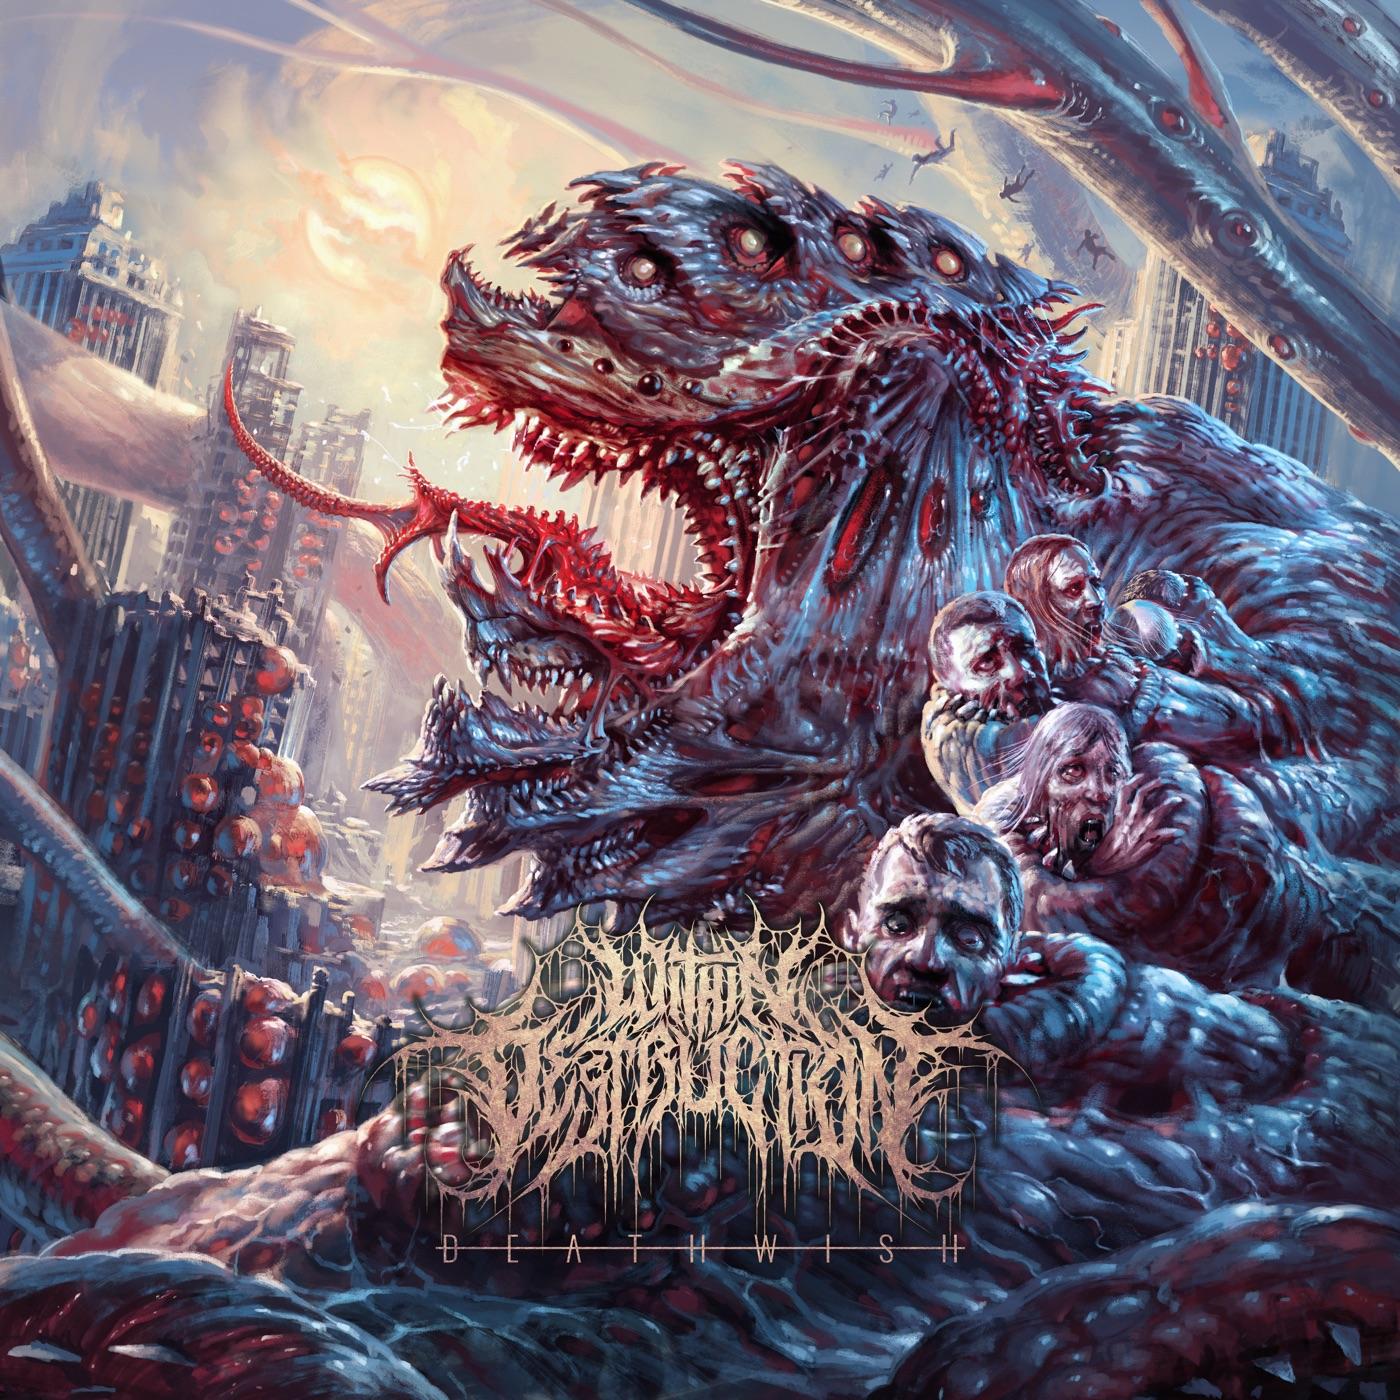 Within Destruction - Deathwish (2018)